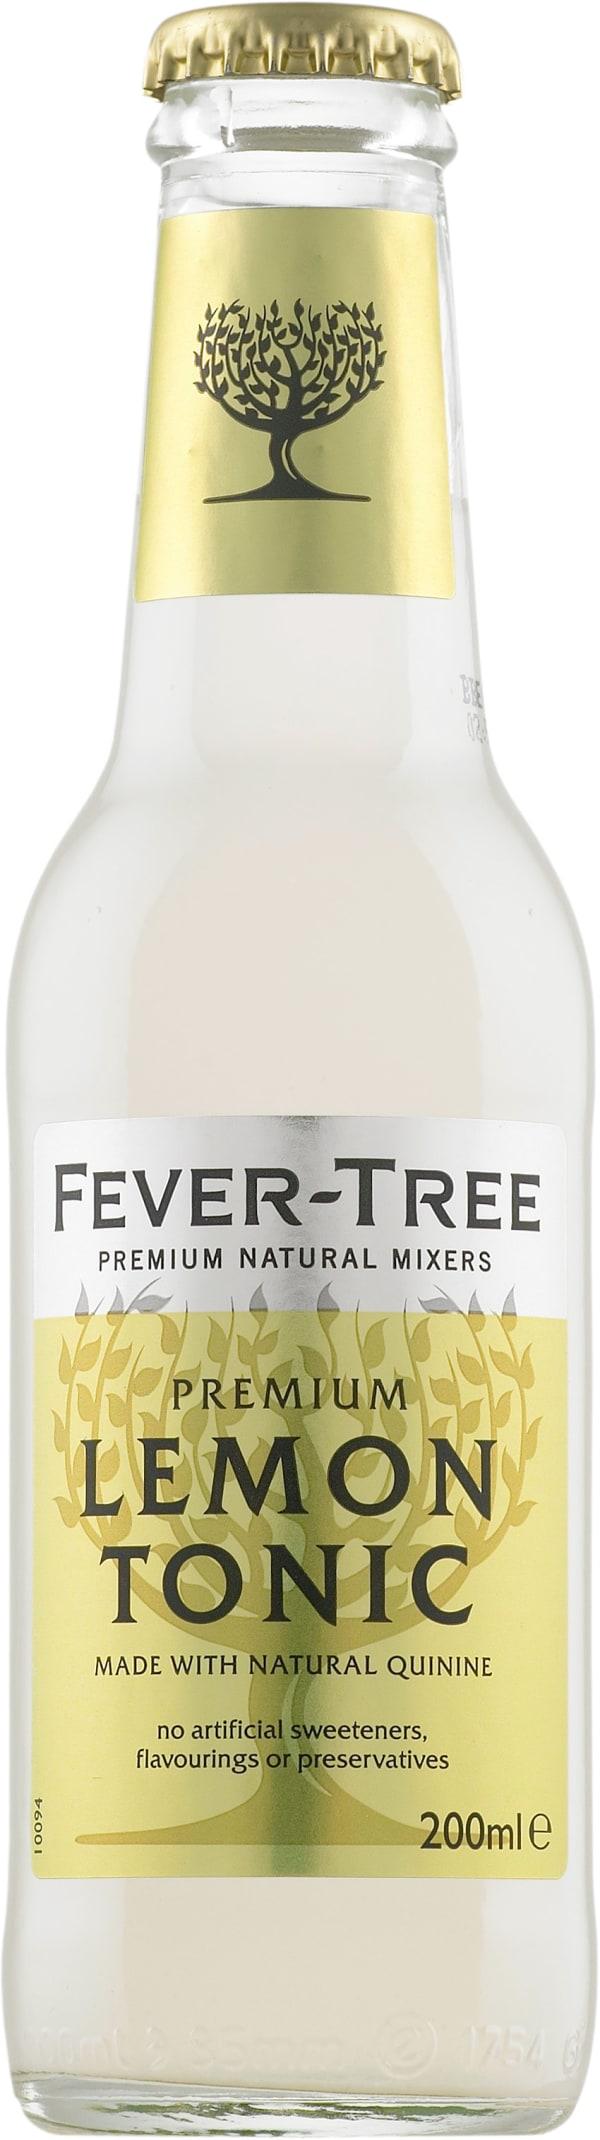 Fever-Tree Premium Lemon Tonic Water